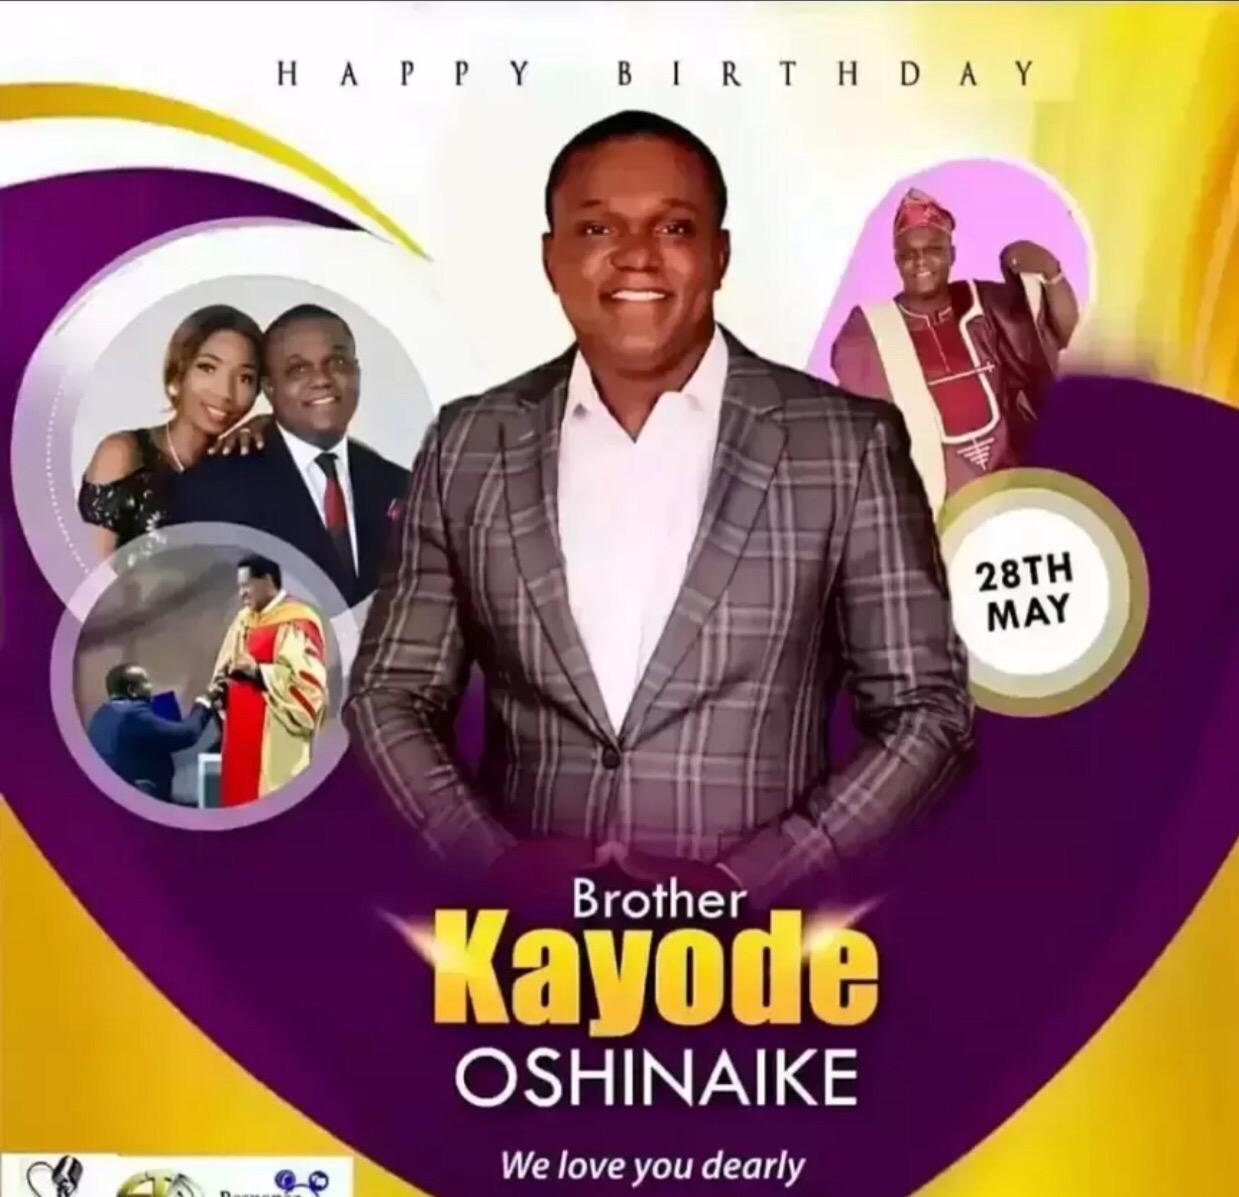 Happy birthday brother kayode, thank